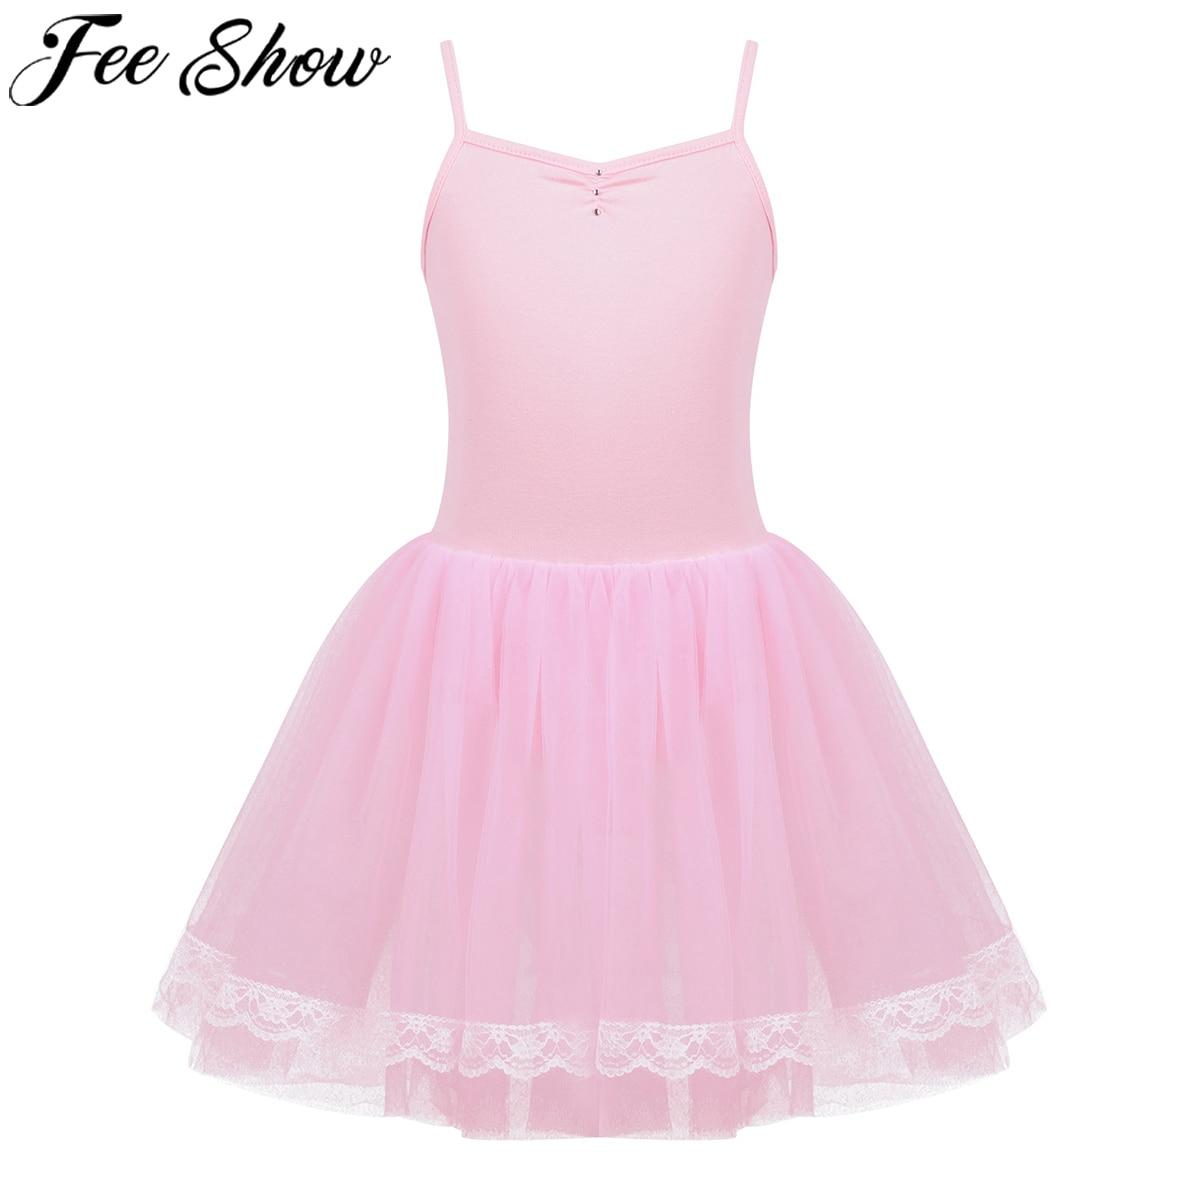 FEESHOW Kids Girls Dancing Dress Up Bowknot Rhinestone Shiny Ballet Dance Gymnastics Leotard Mesh Tutu Skirt Ballerina Costume